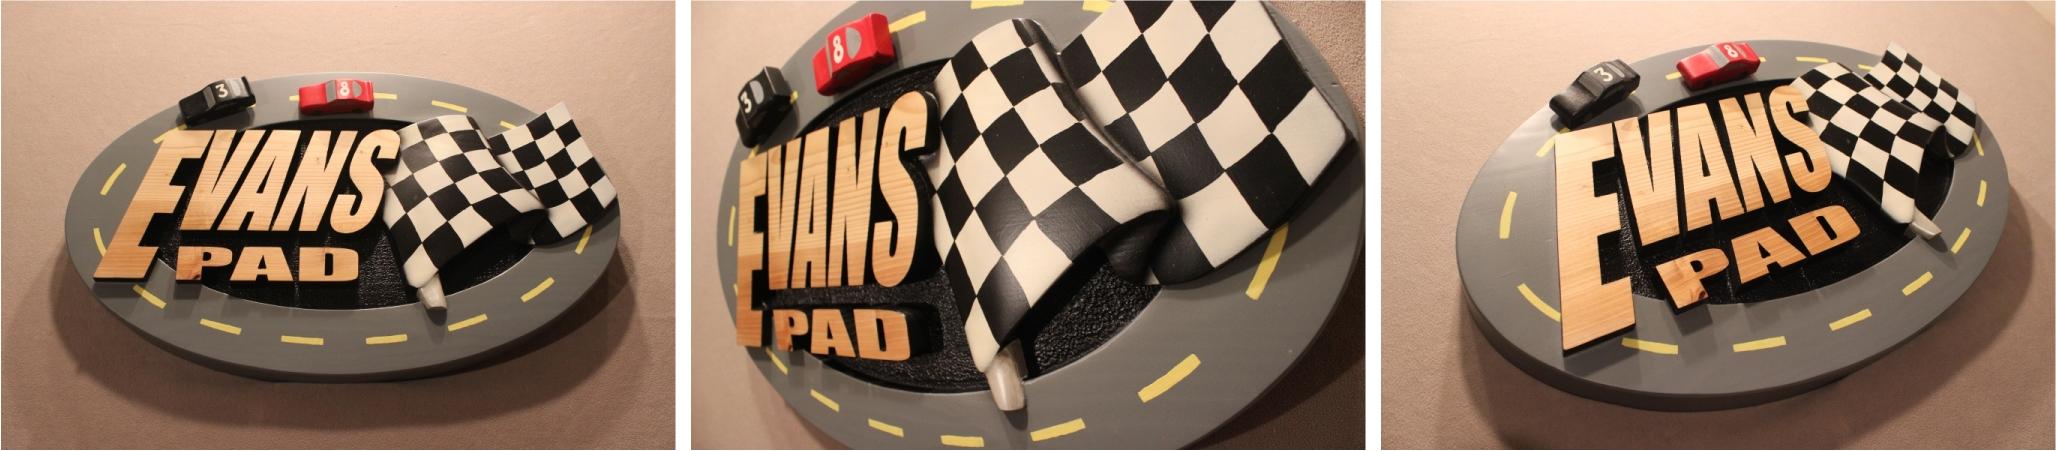 Evans Pad FWS.jpg